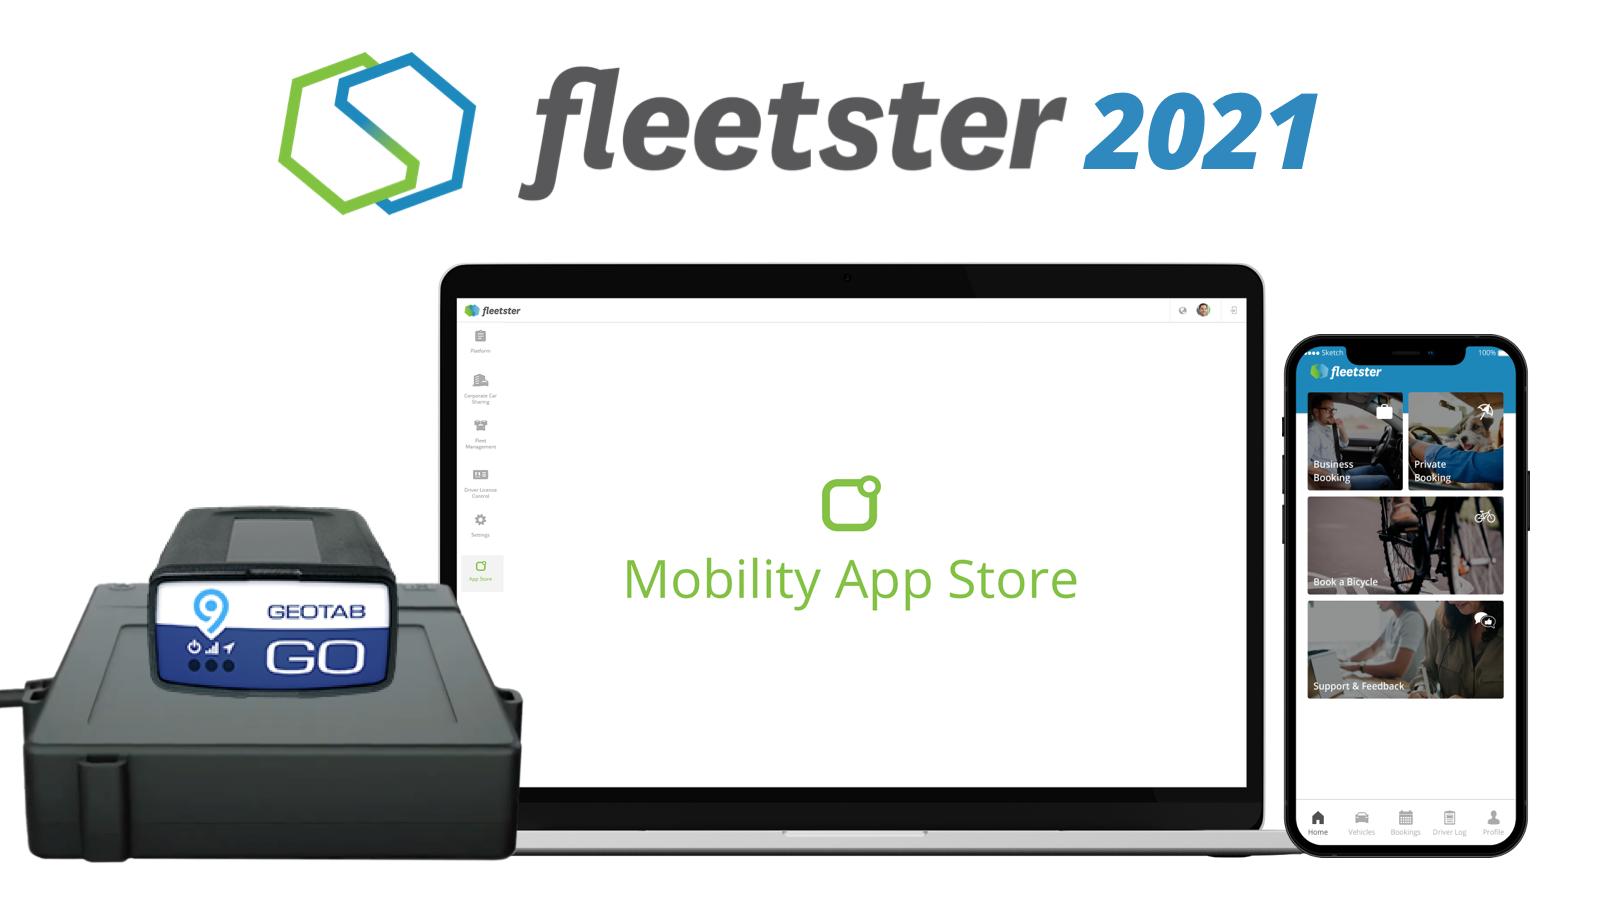 fleetster Fleet Management Portfolio